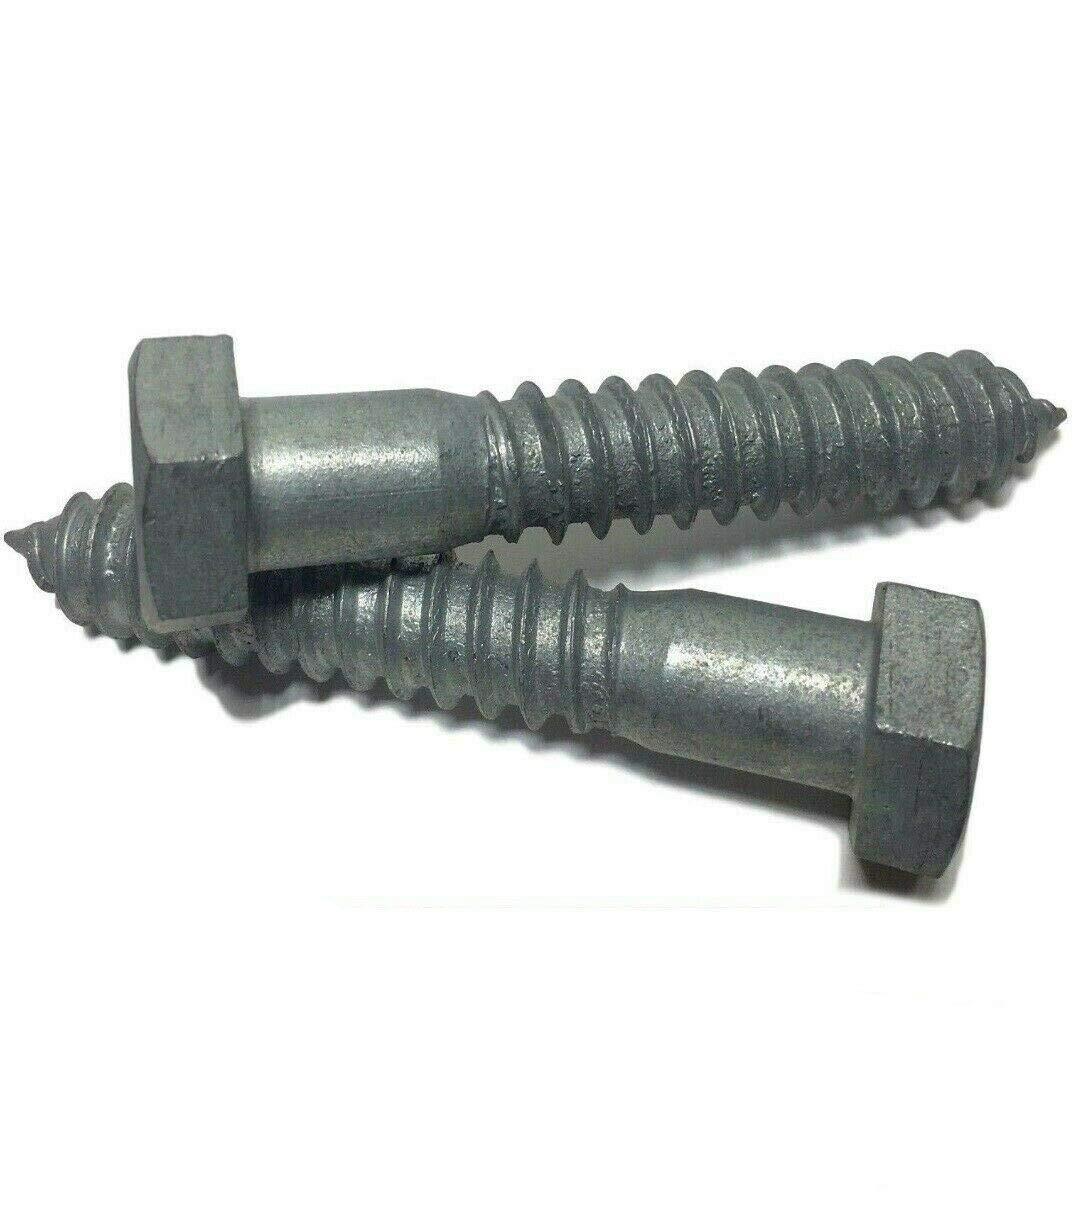 Lag Screws 1//2 x 3 Hex Head Lag Screw//Bolt Hot Dipped Galvanized HDG 25 Pcs Quality Metal Fast